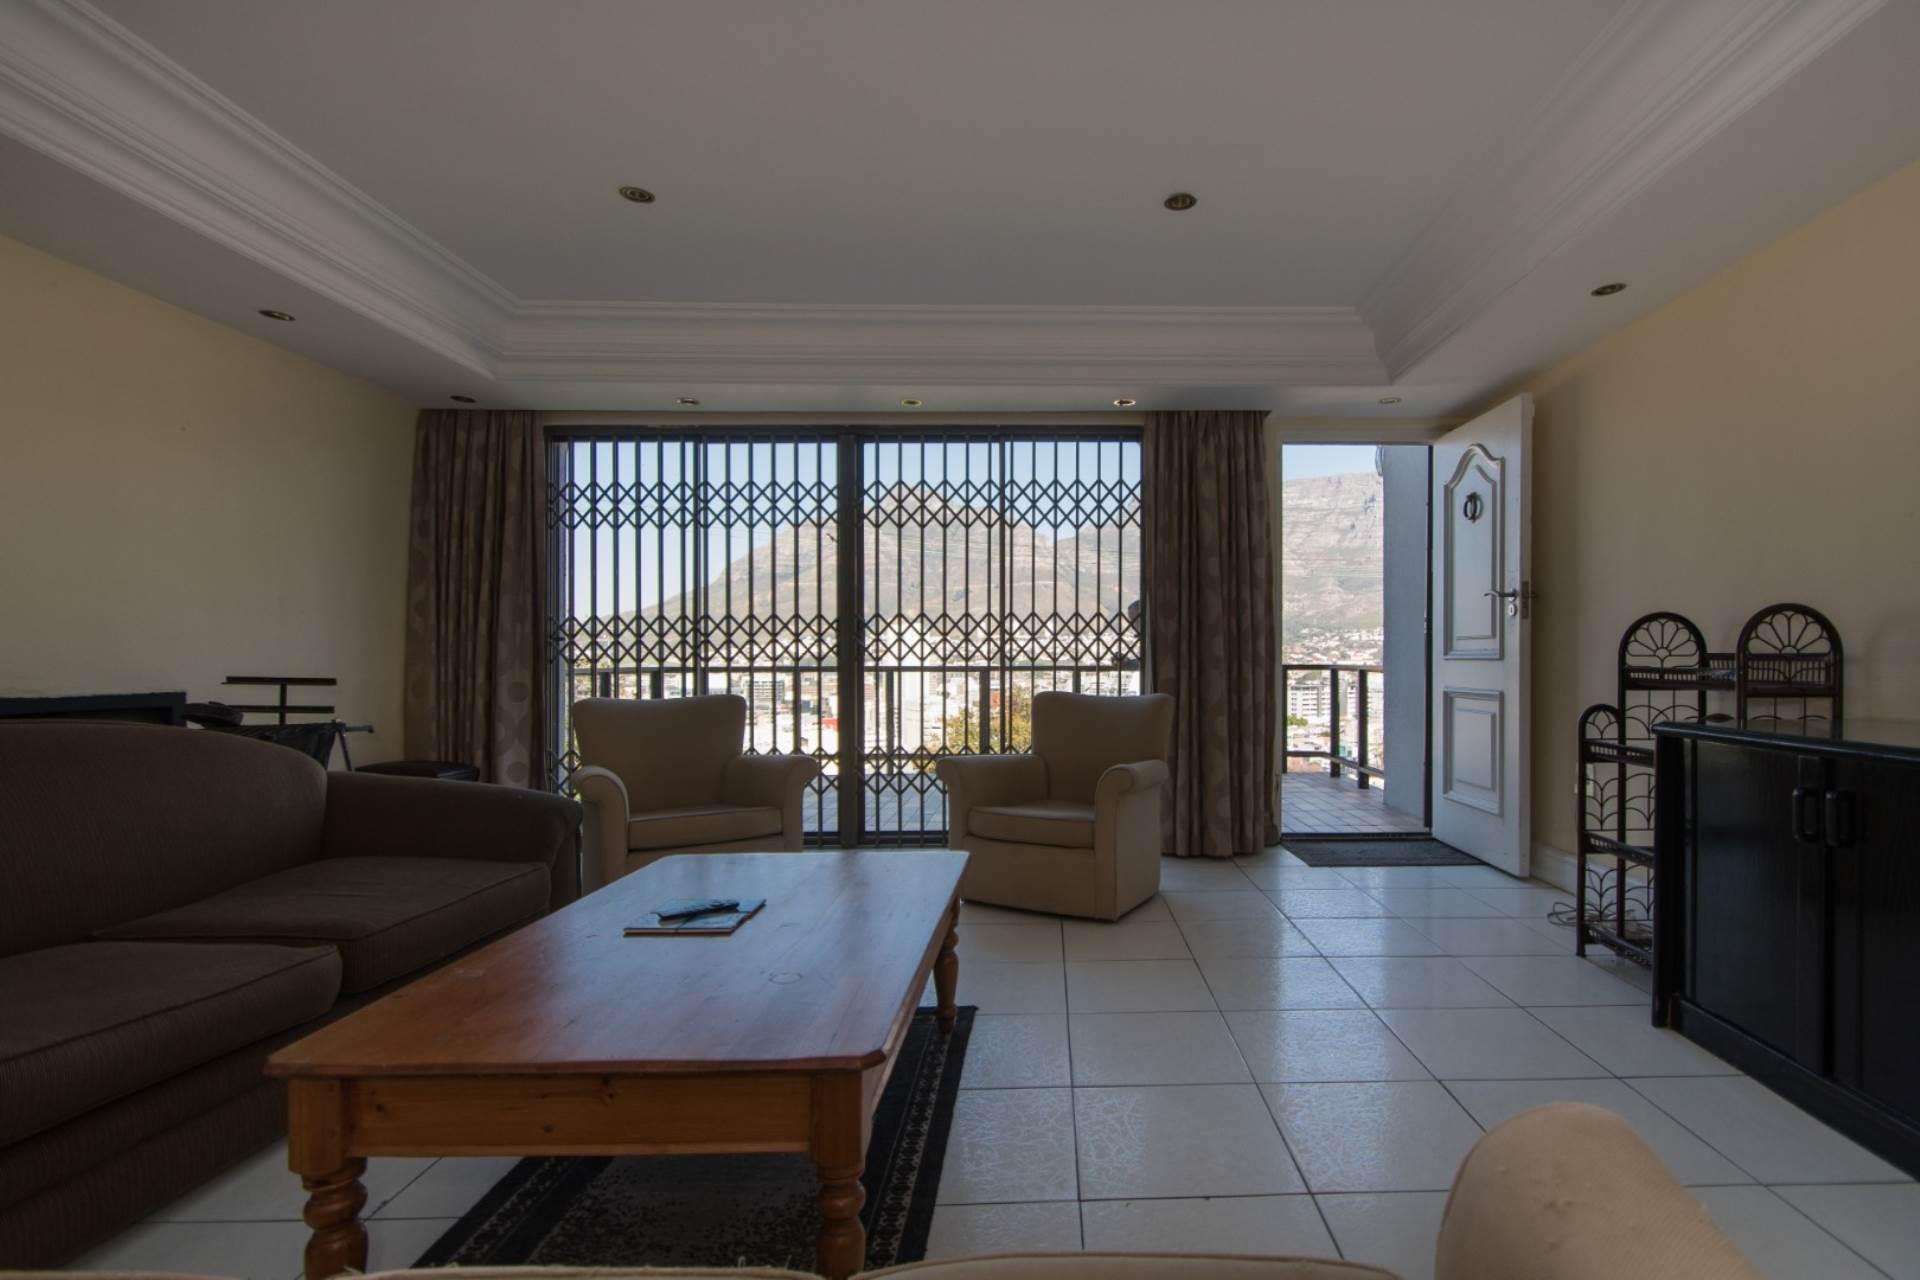 5 Bedroom House For Sale in Bo Kaap